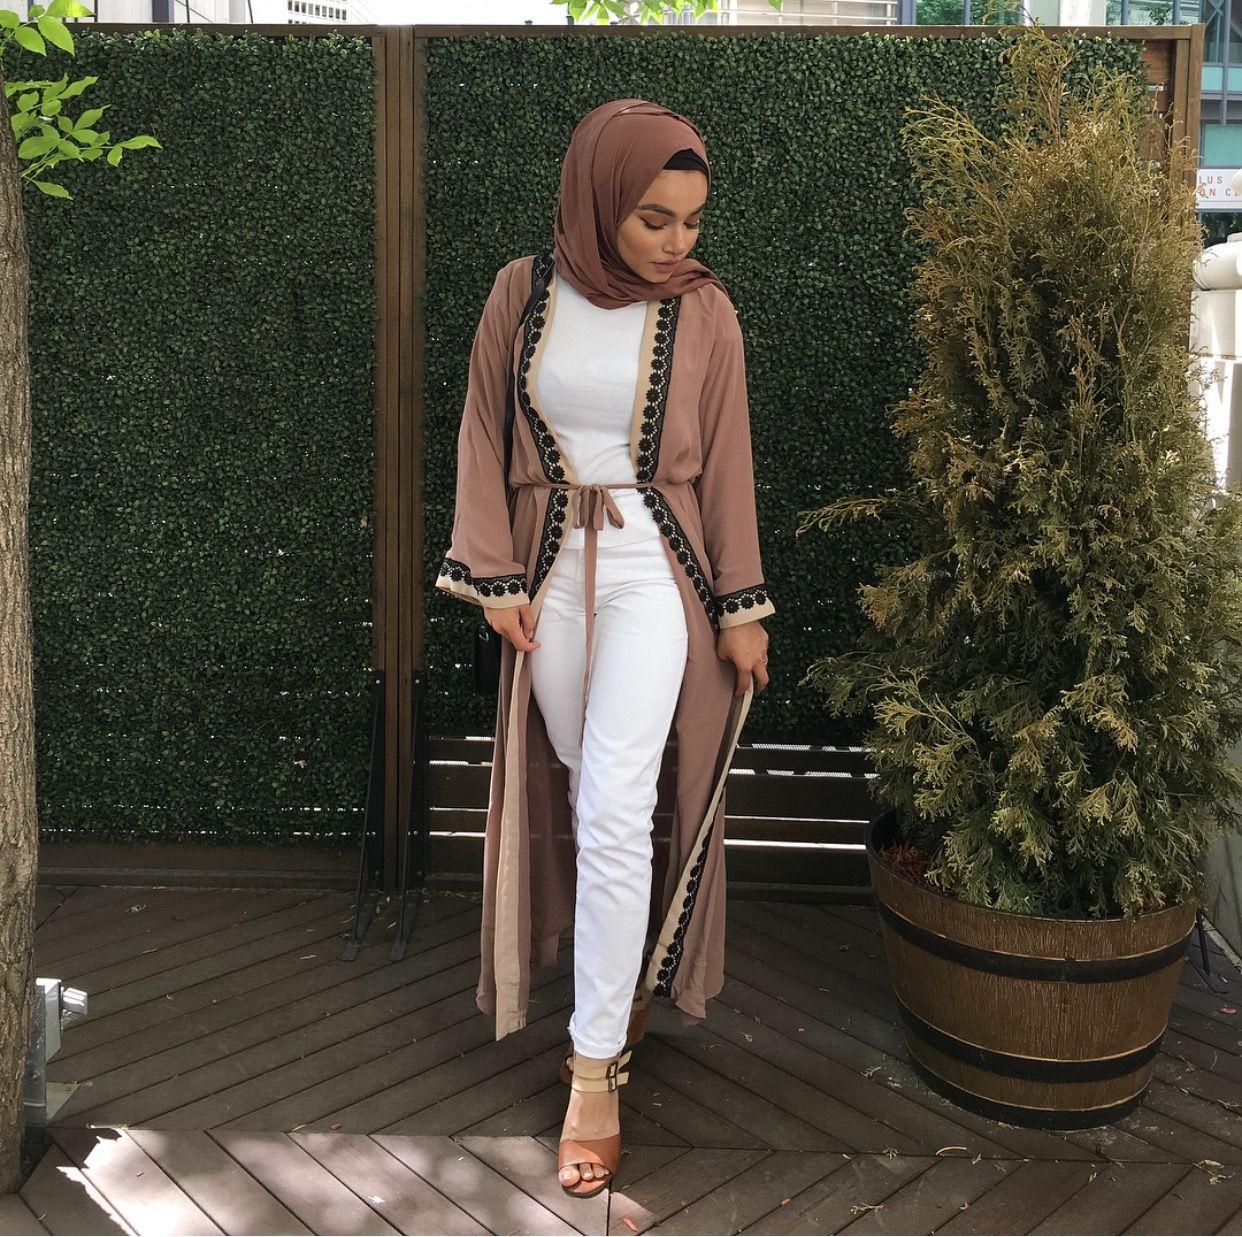 inspiring modest casual bedroom | Pinterest @adarkurdish 🌸 hijab style #casual #white | Cute ...